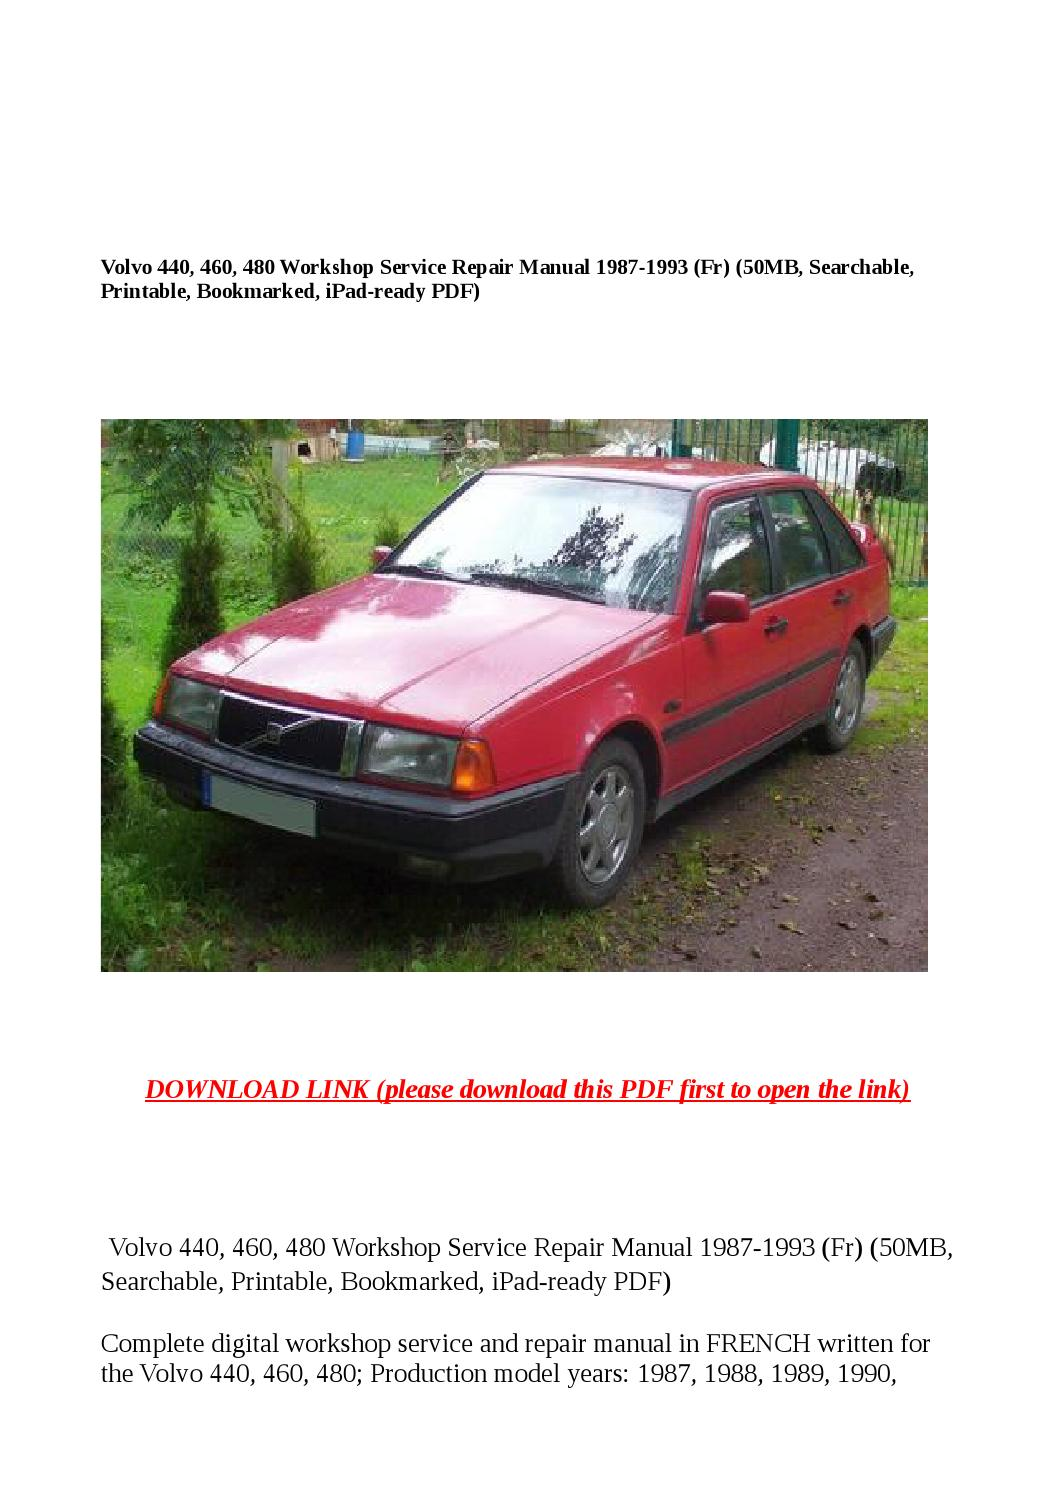 Service & Repair Manuals Download Link Volvo Workshop Service and ...